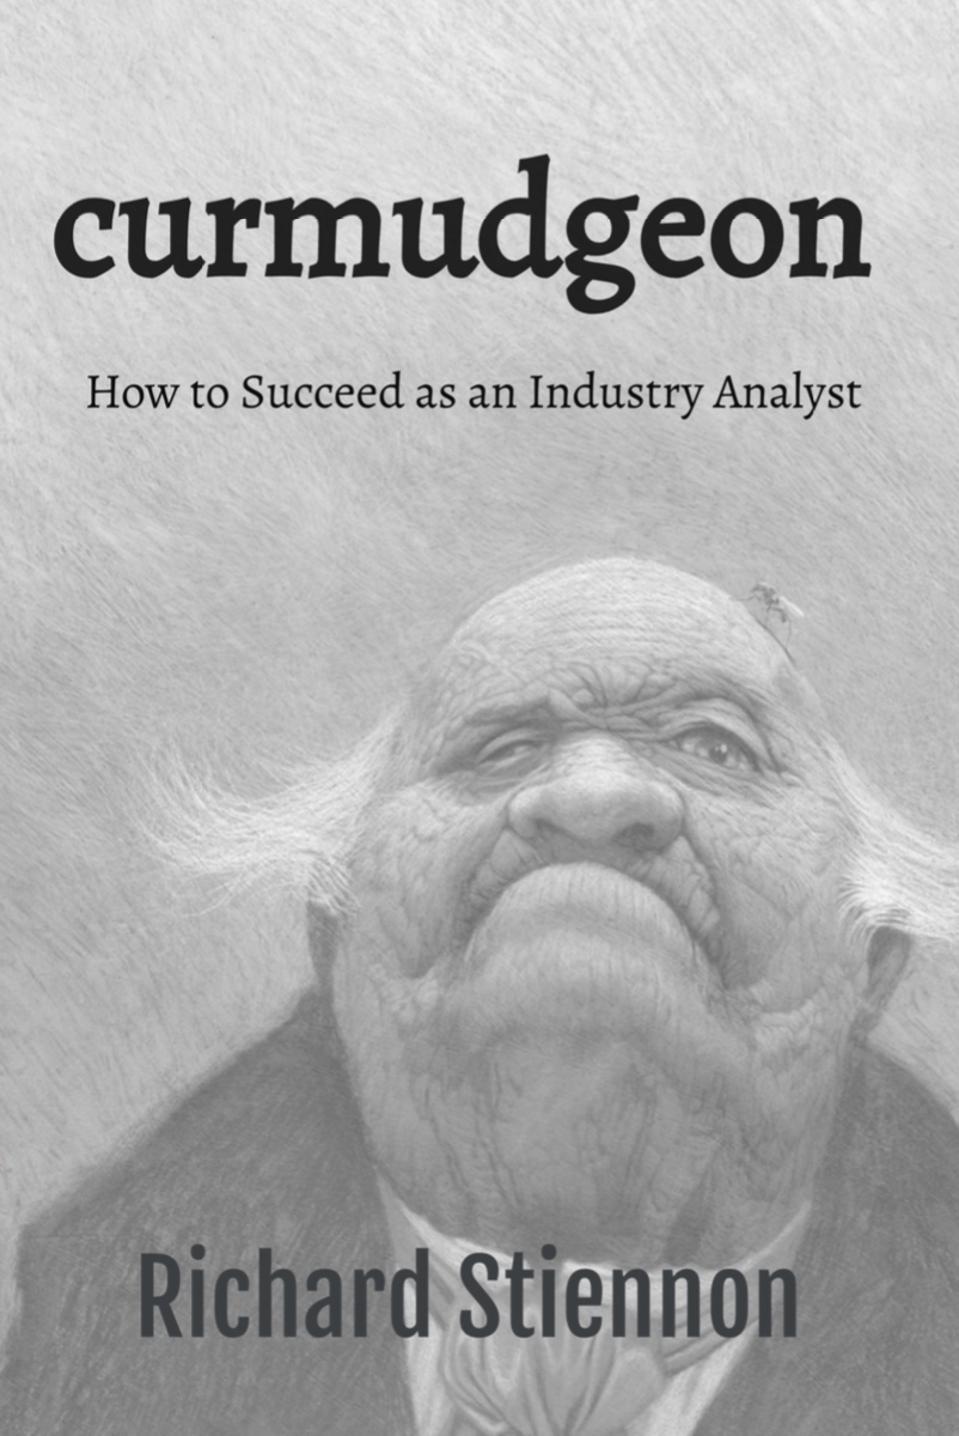 A grumpy old curmudgeon